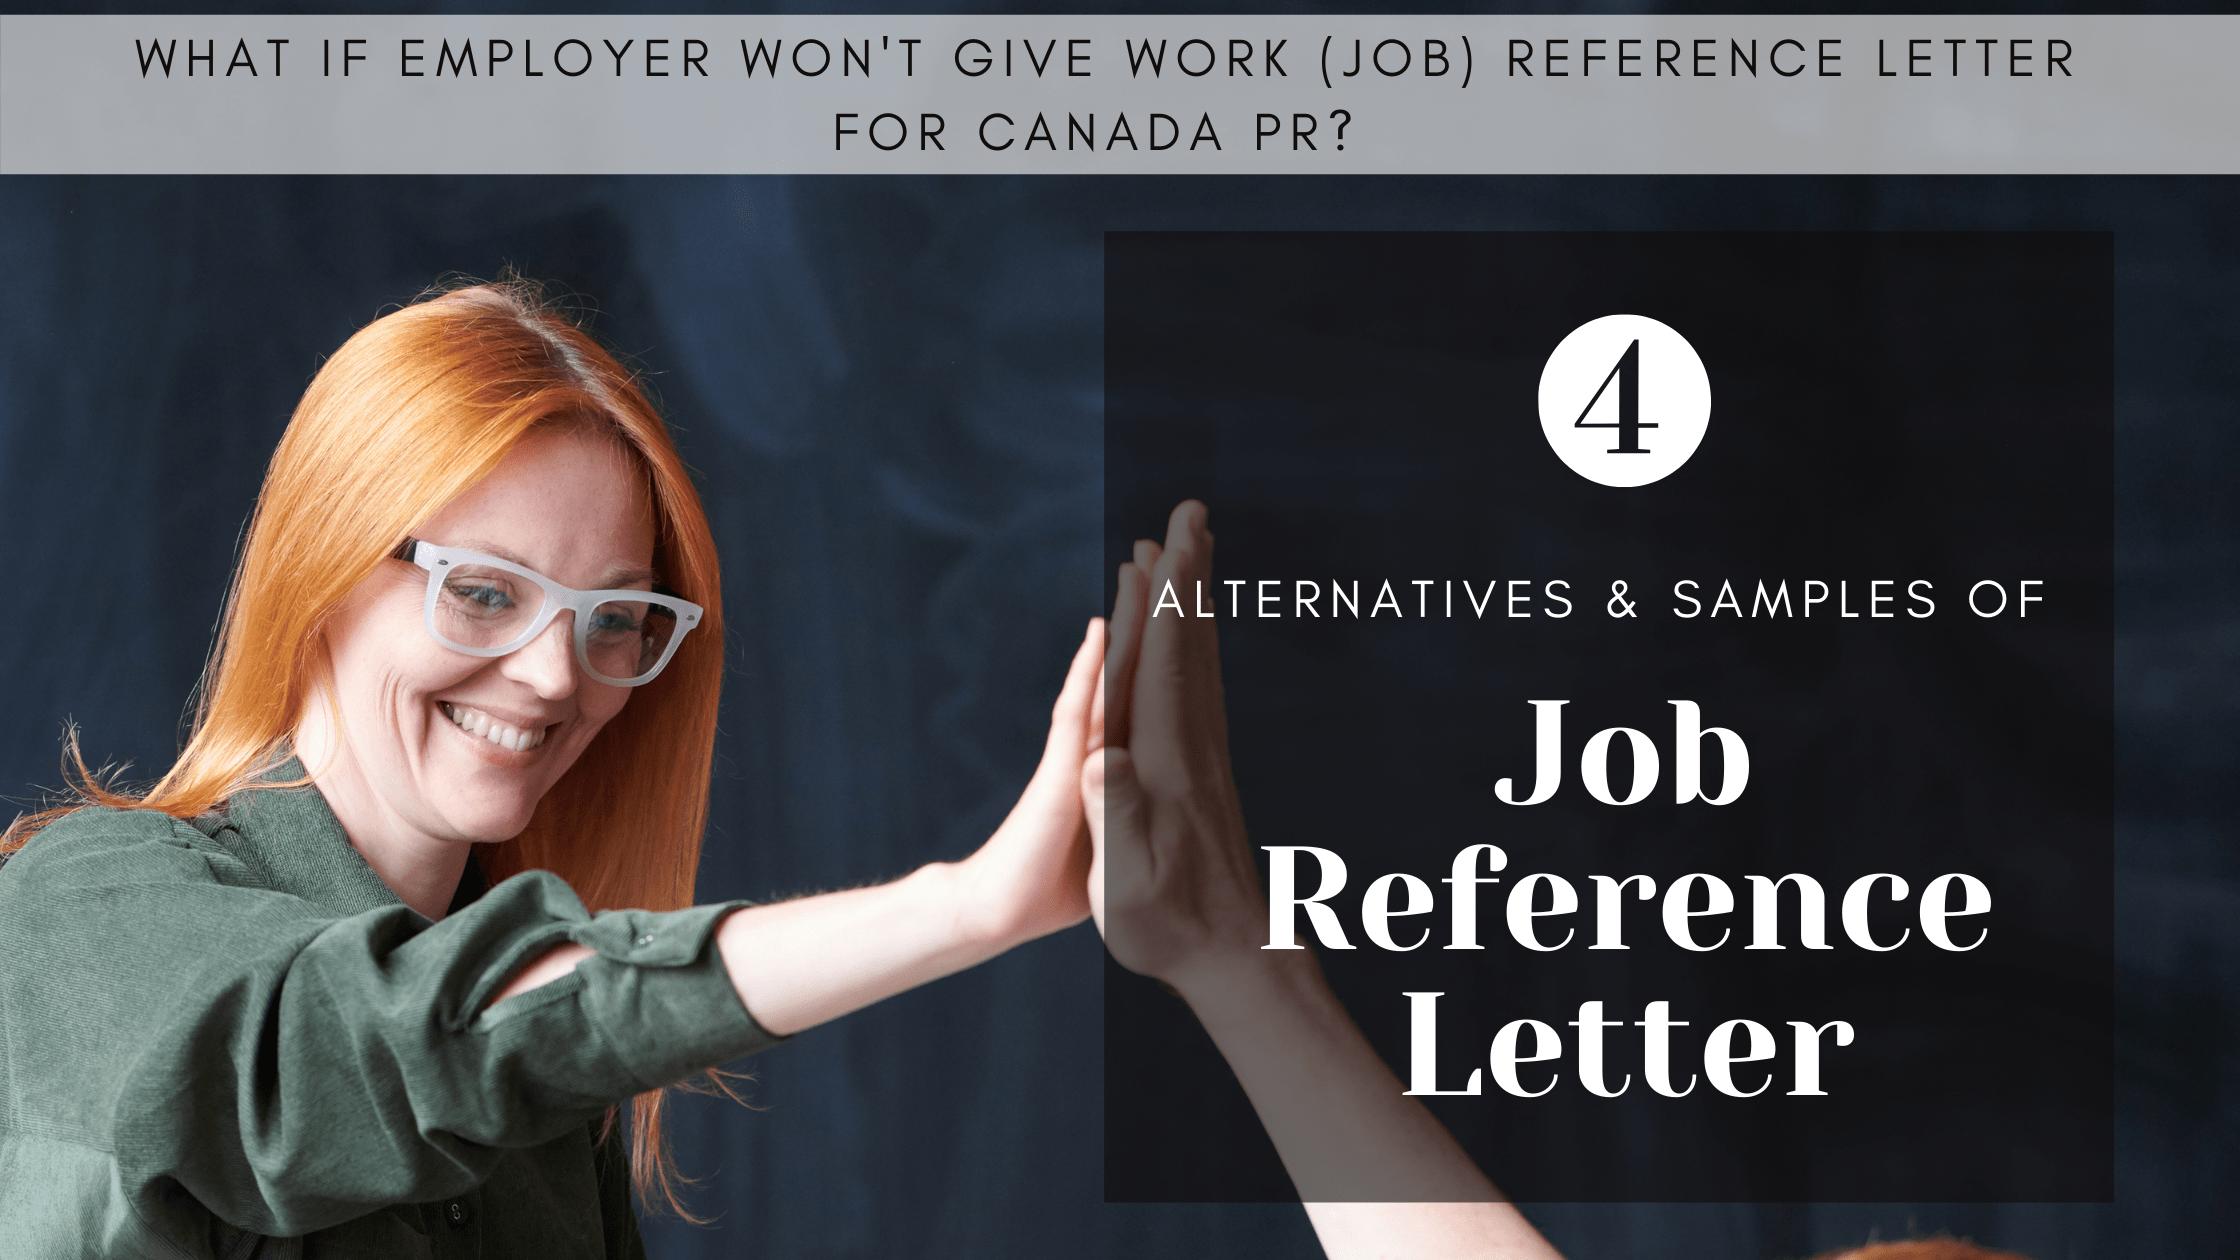 4 Alternatives & Samples To Job Reference Letter: Canada PR